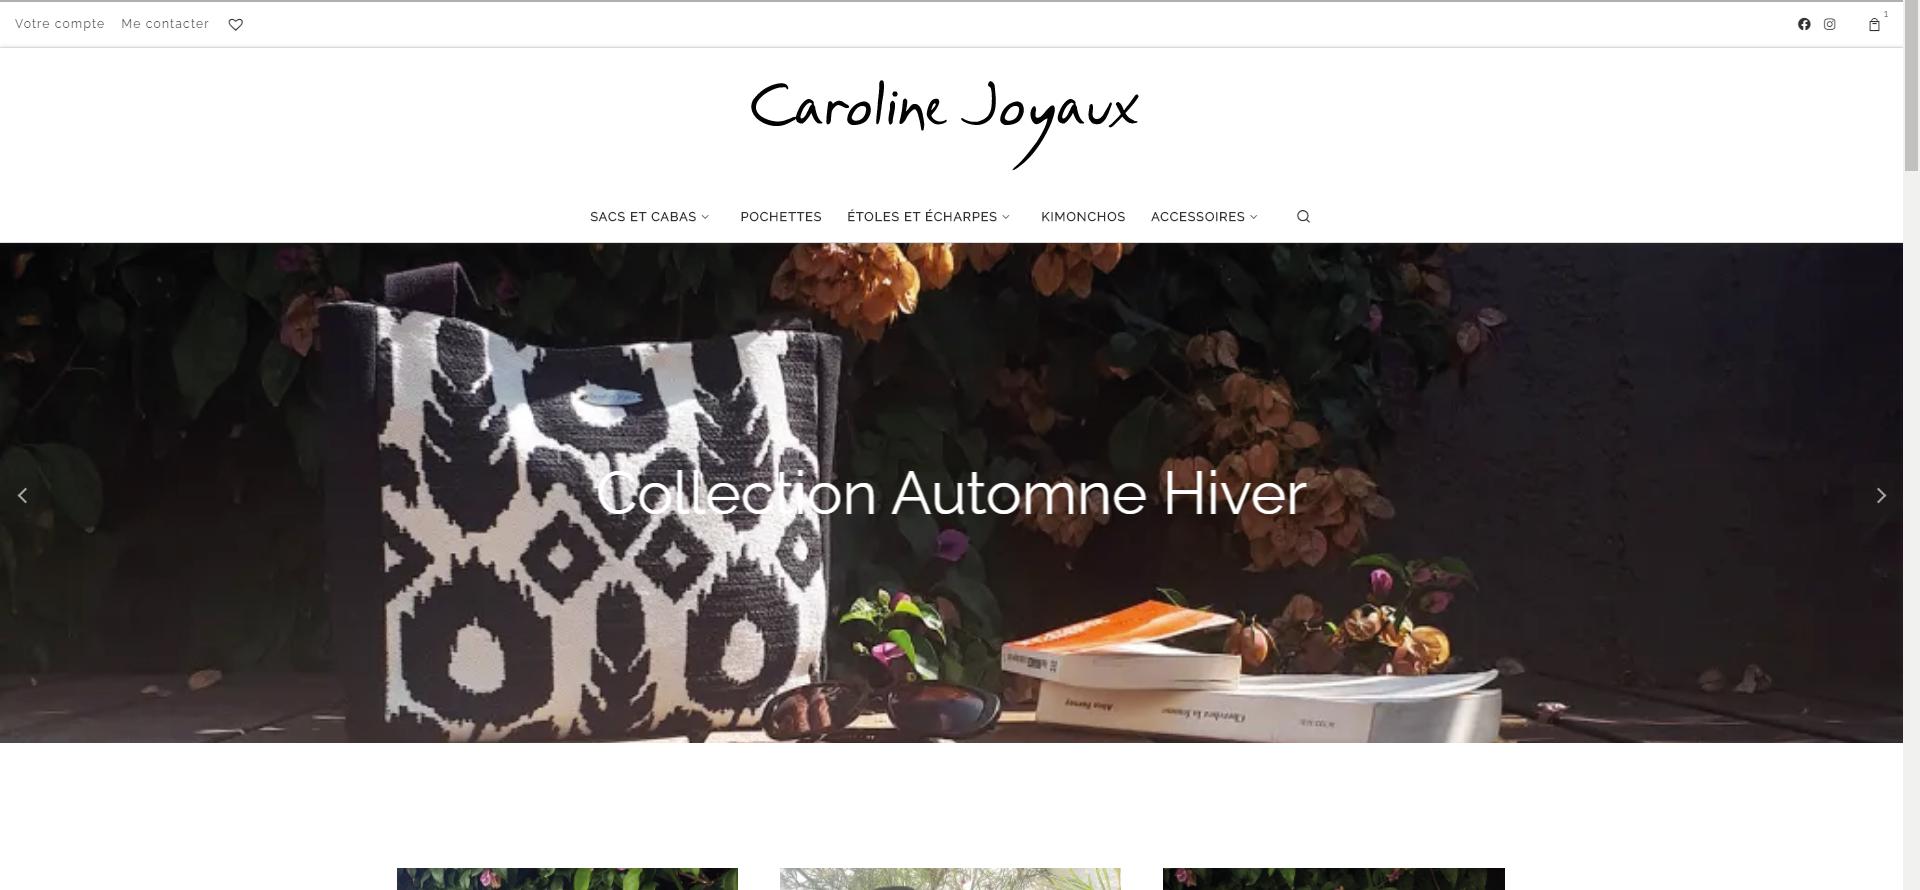 caroline joyaux boutique en ligne - Caroline Joyaux, boutique en ligne